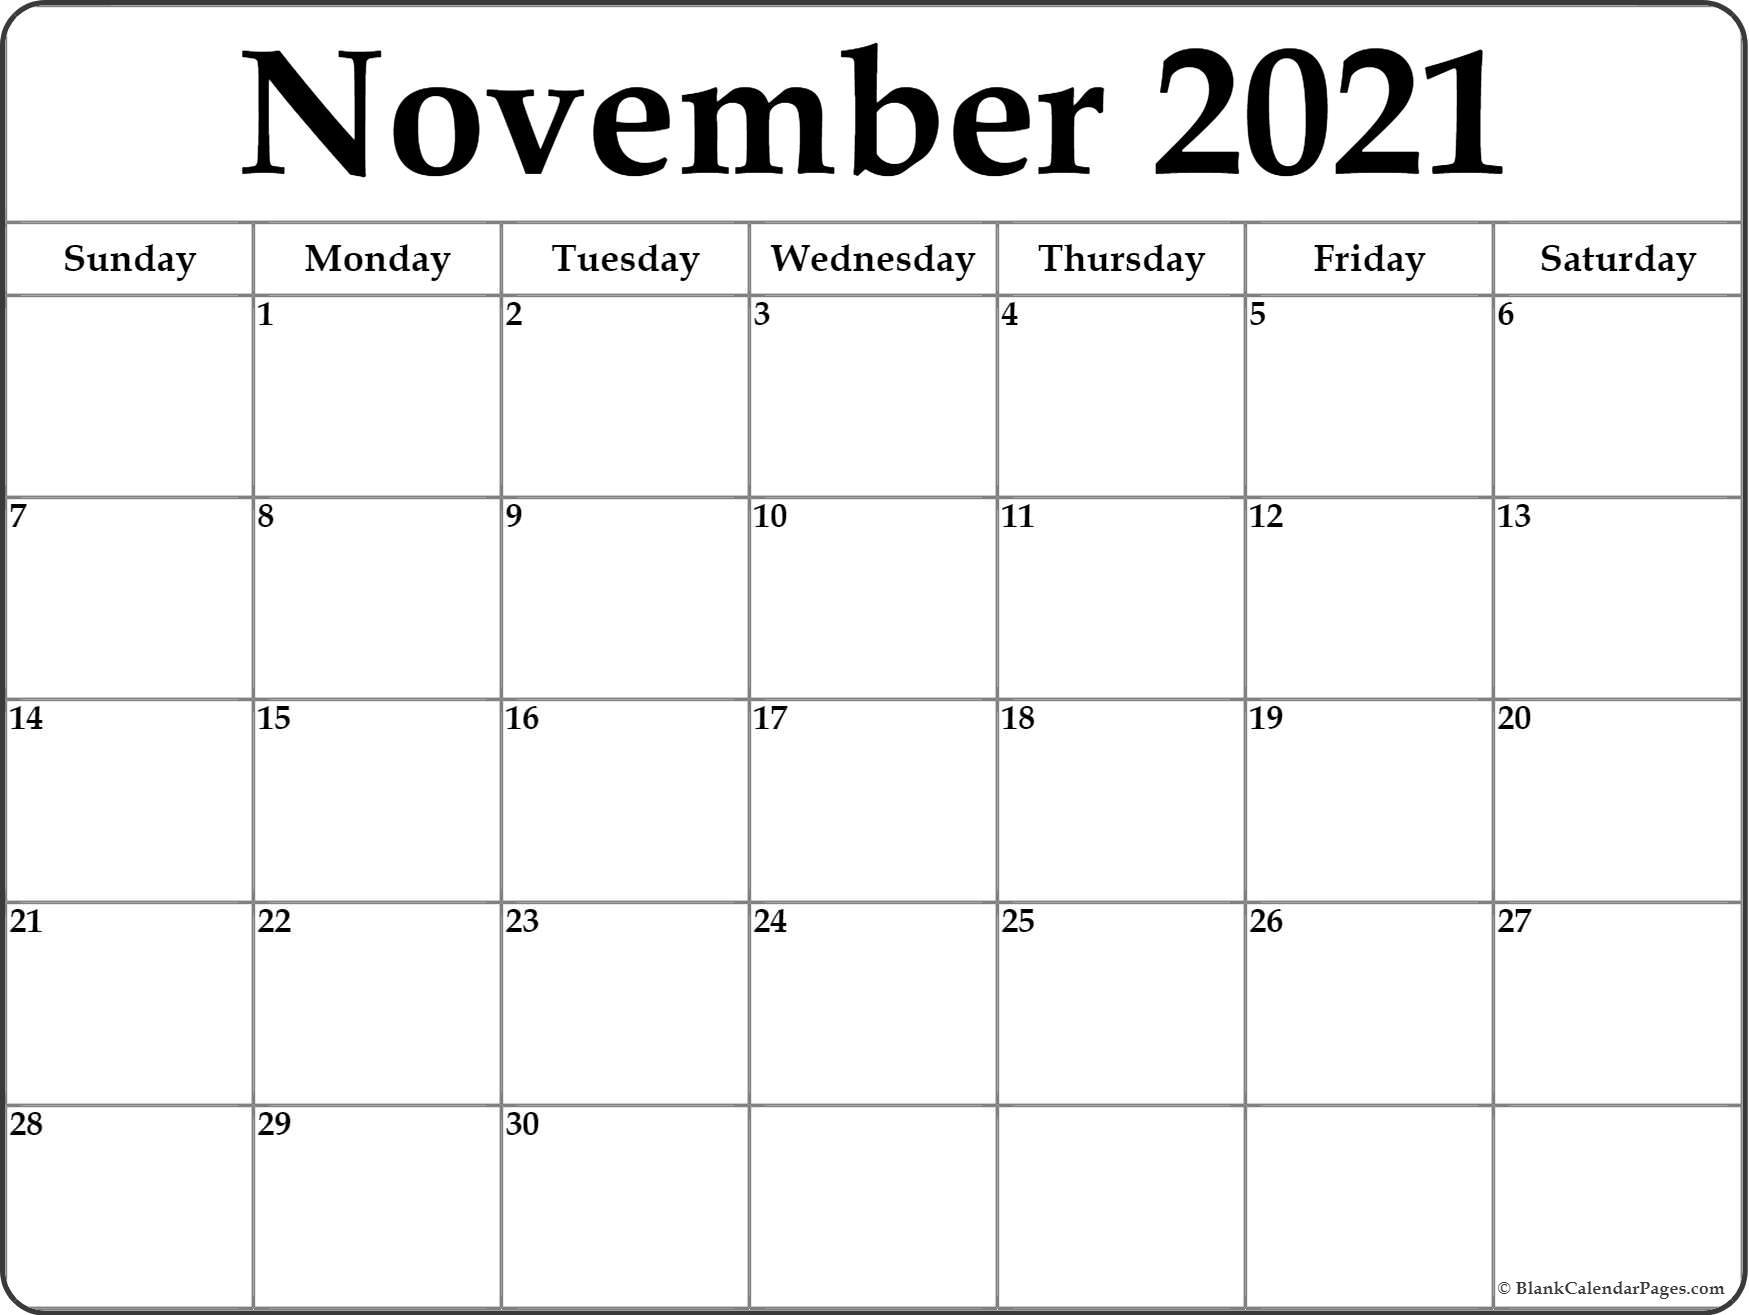 November 2021 Calendar | Free Printable Monthly Calendars For Calendar With November 2021 Mexican Names